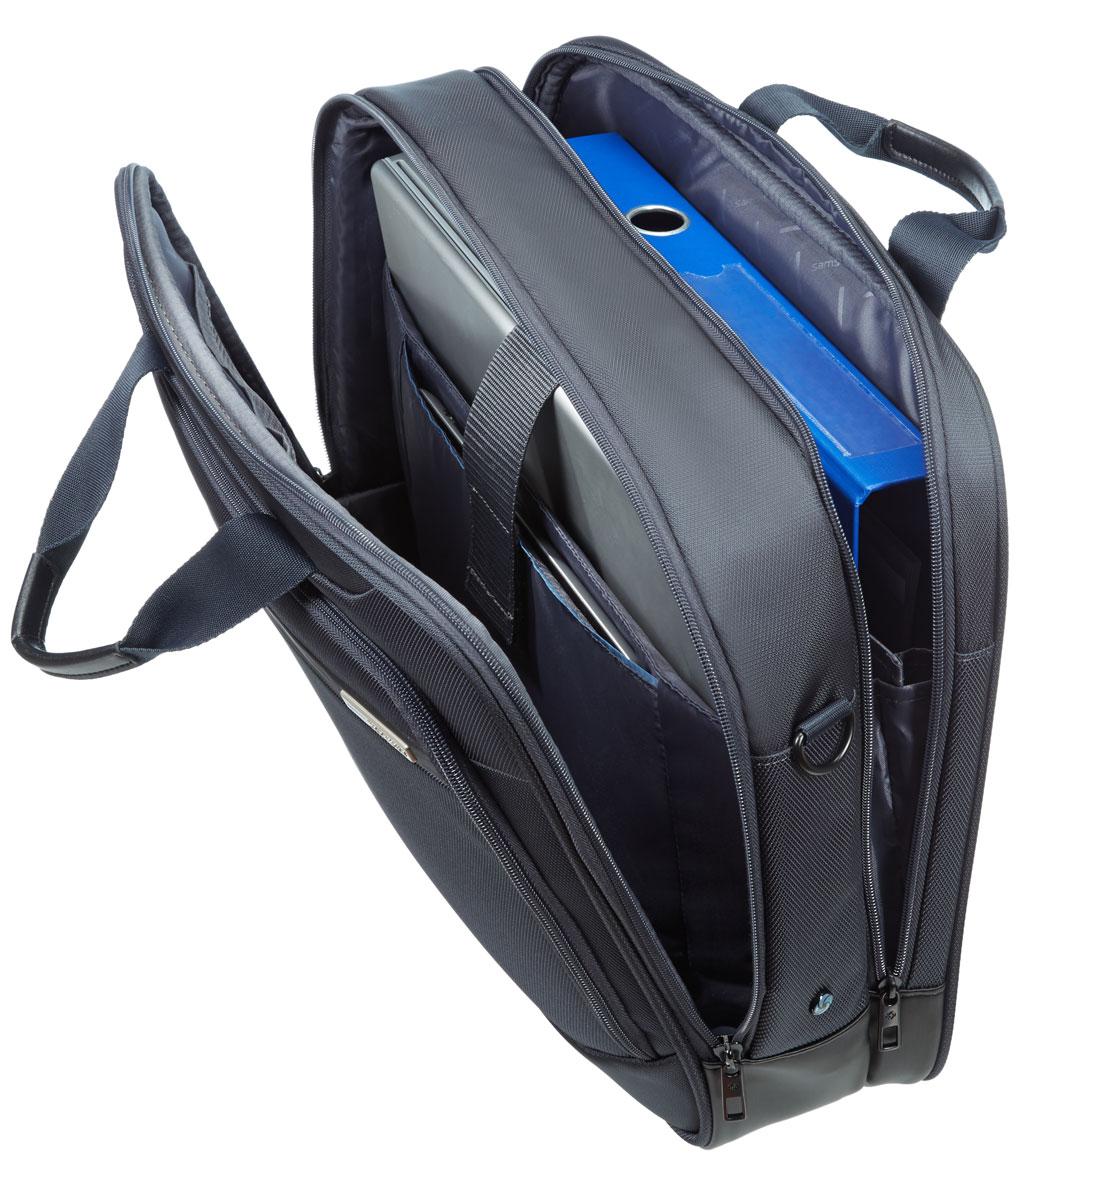 Сумка для ноутбука Samsonite GuardIt, цвет: темно-серый, 43,5 х 33 х 13,5 см сумка для документов samsonite